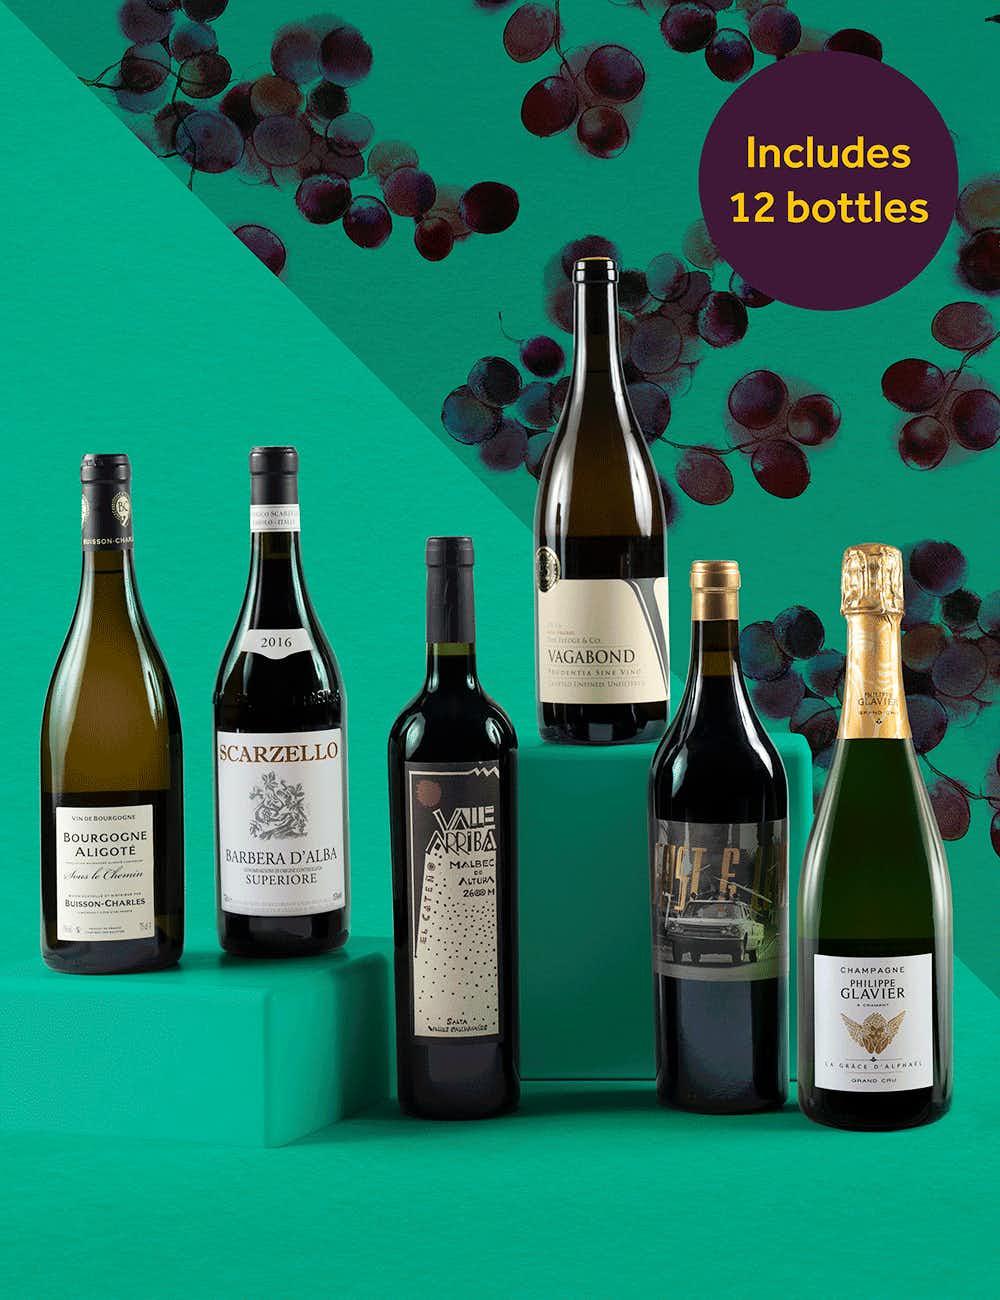 Wine& a special wine club night